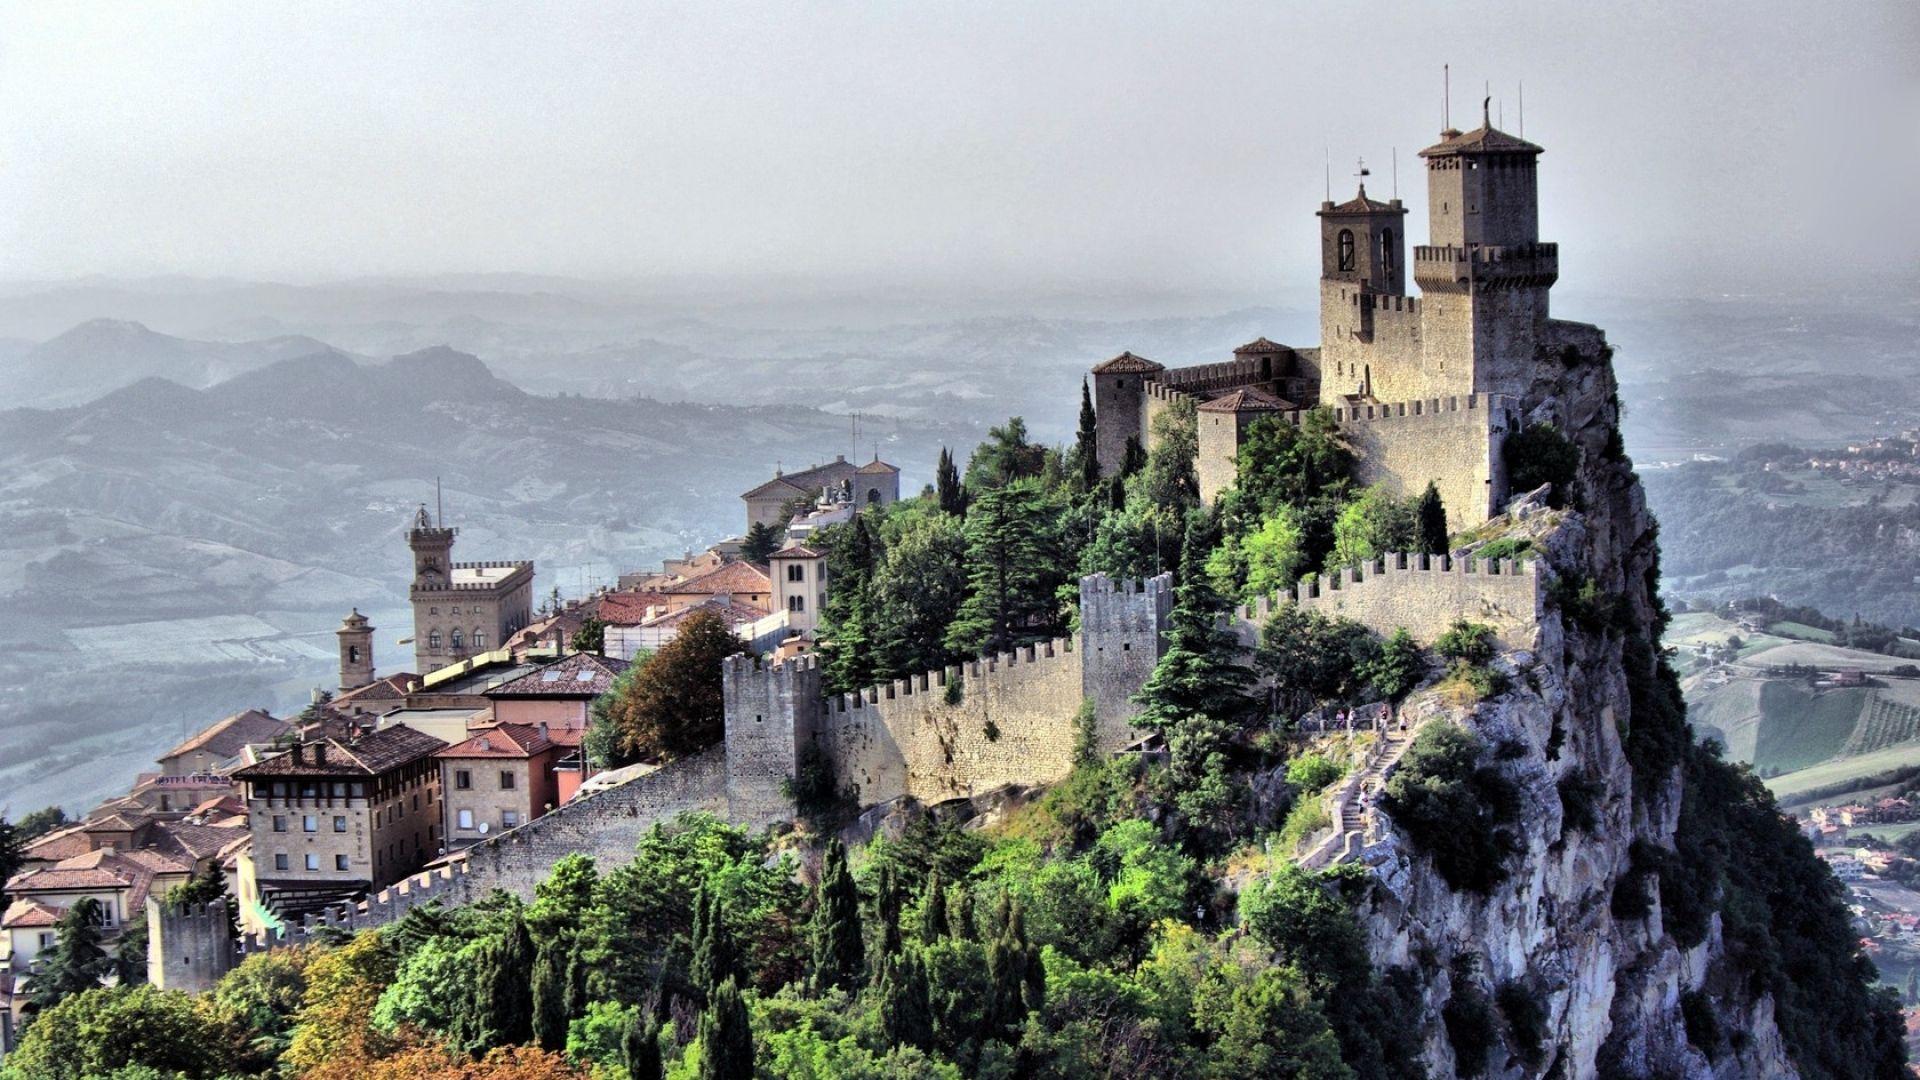 1920x1080 Wallpaper city, country, san marino, landscape, castle, cliff, houses, buildings, mountains, sky